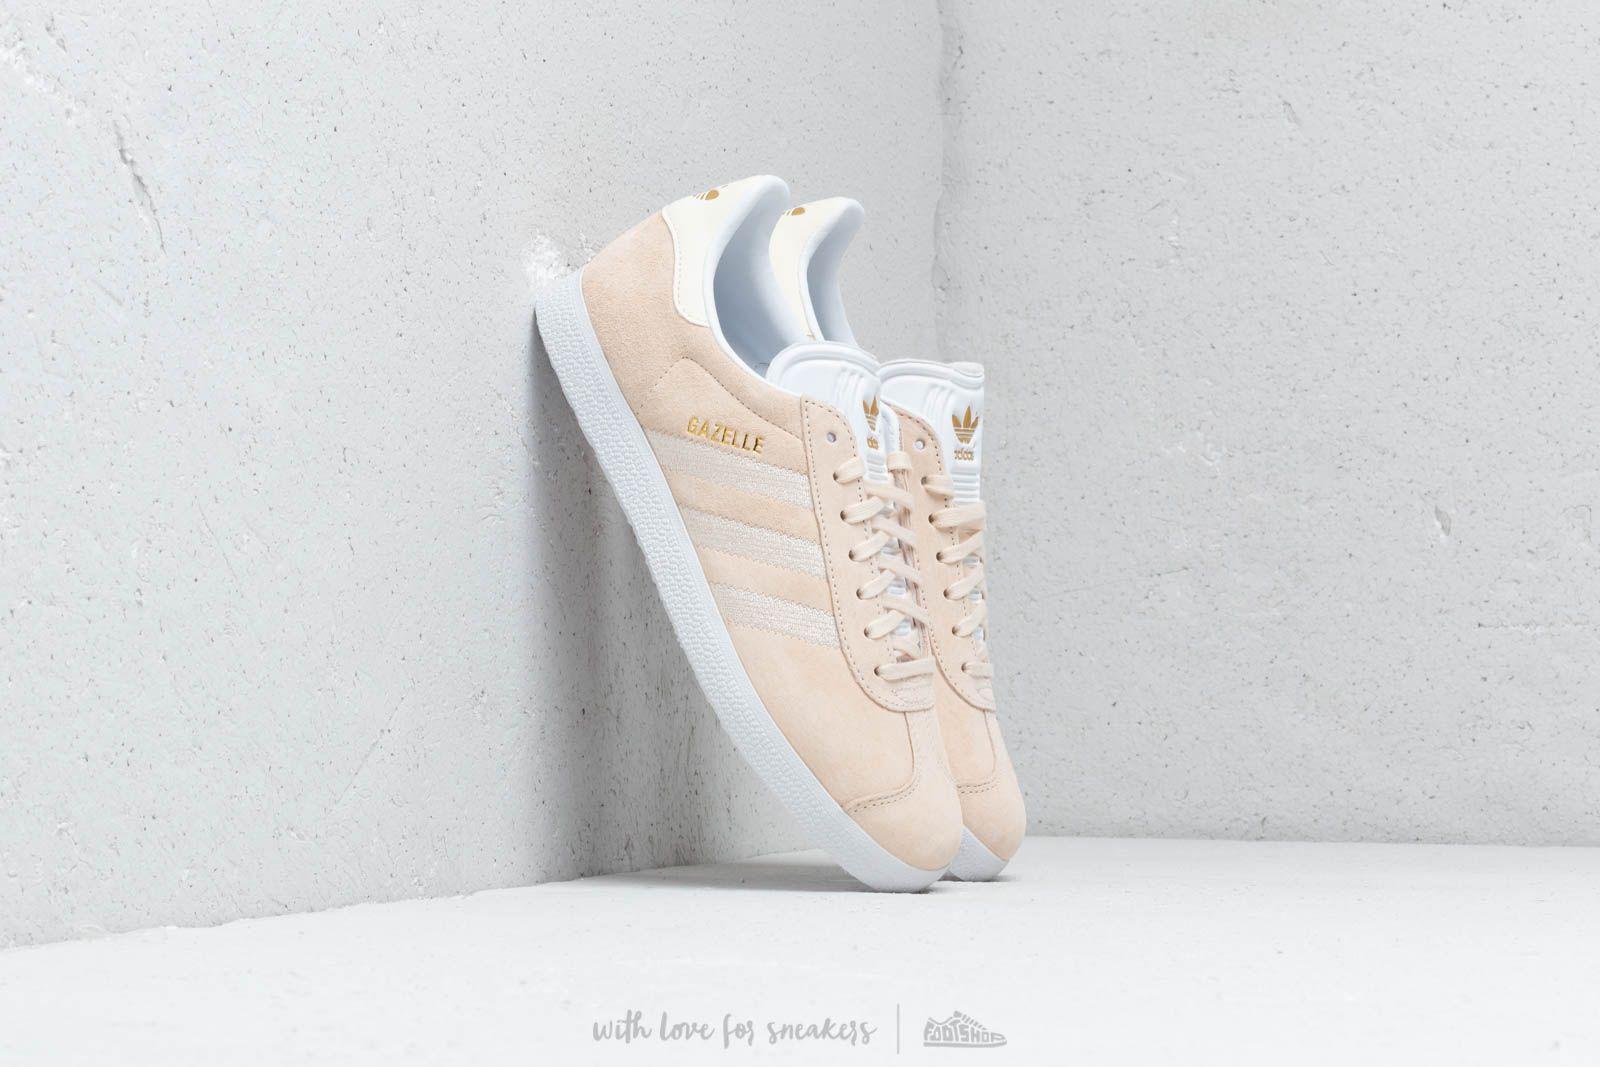 brand new 9aa62 d21e6 adidas Gazelle W Ecrtin  Ecrtin  Ftw White at a great price 92 € buy